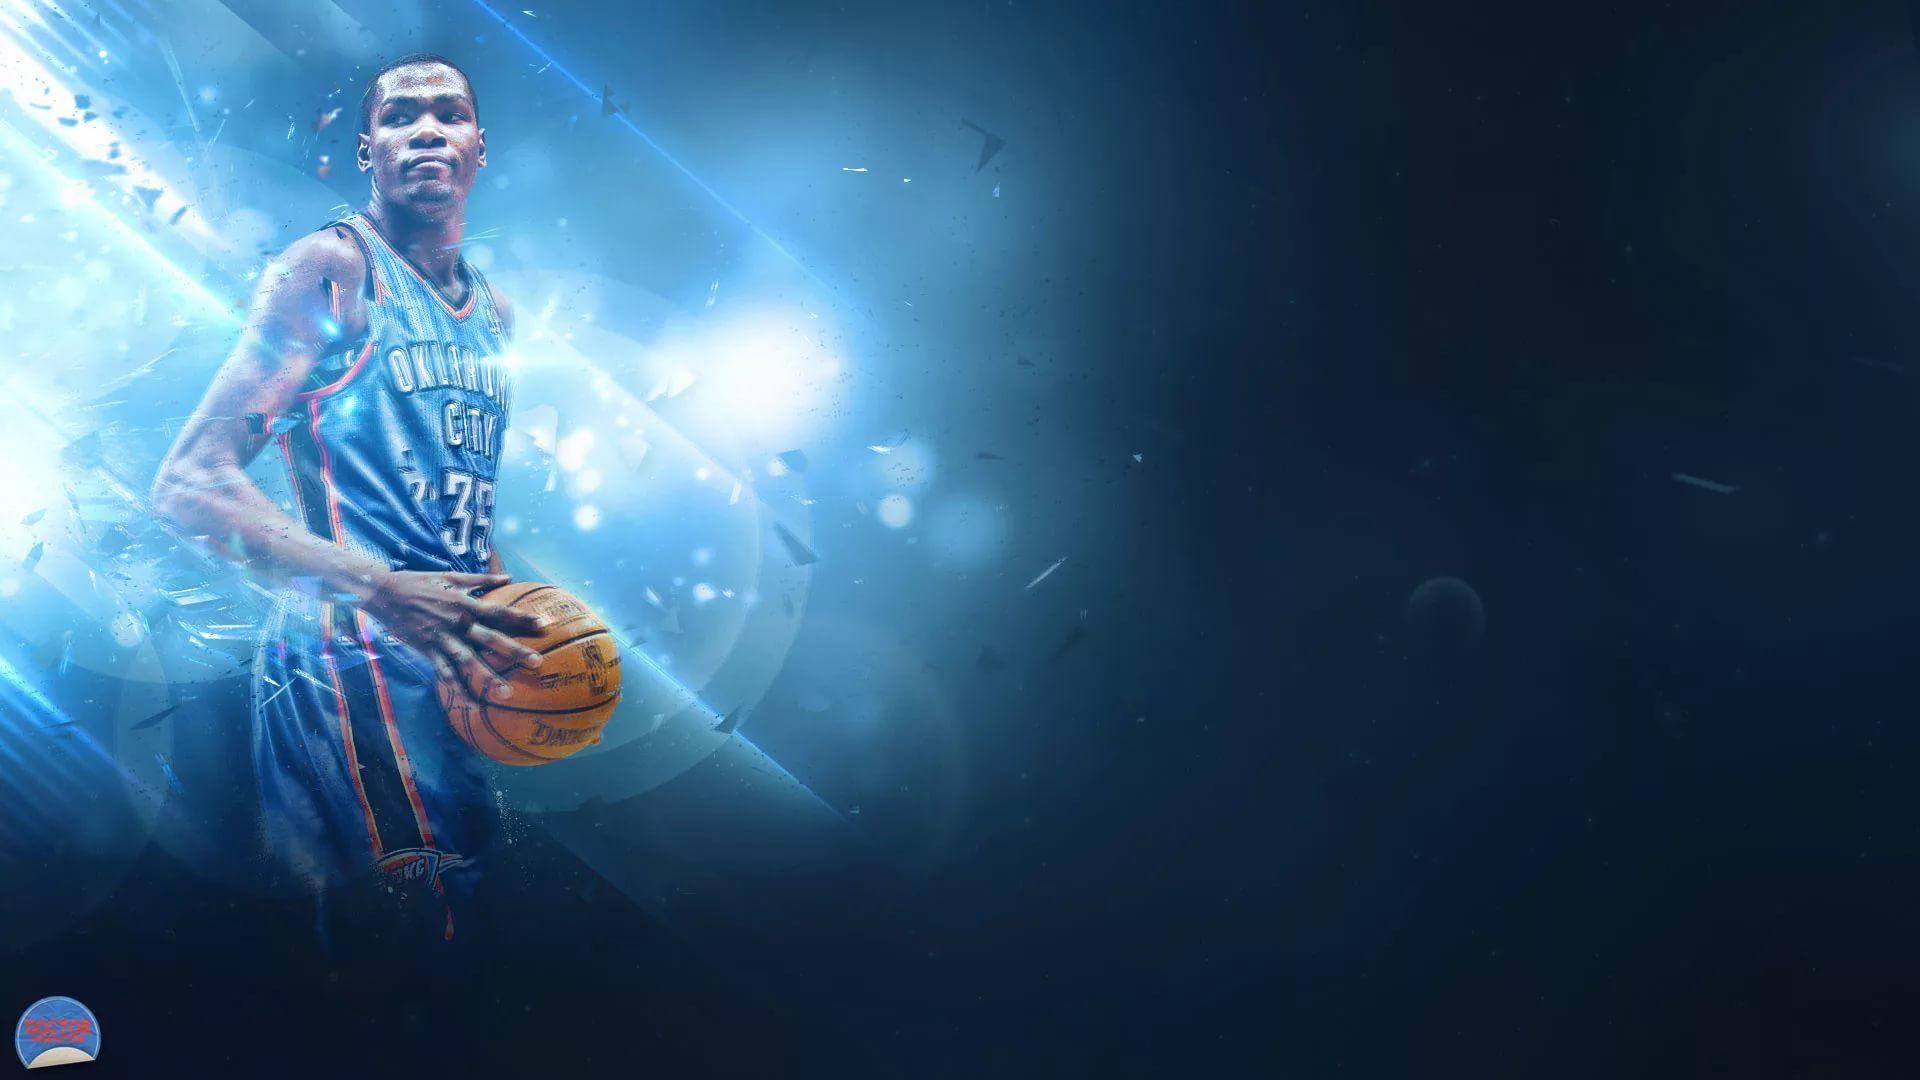 Kevin Durant wallpaper image